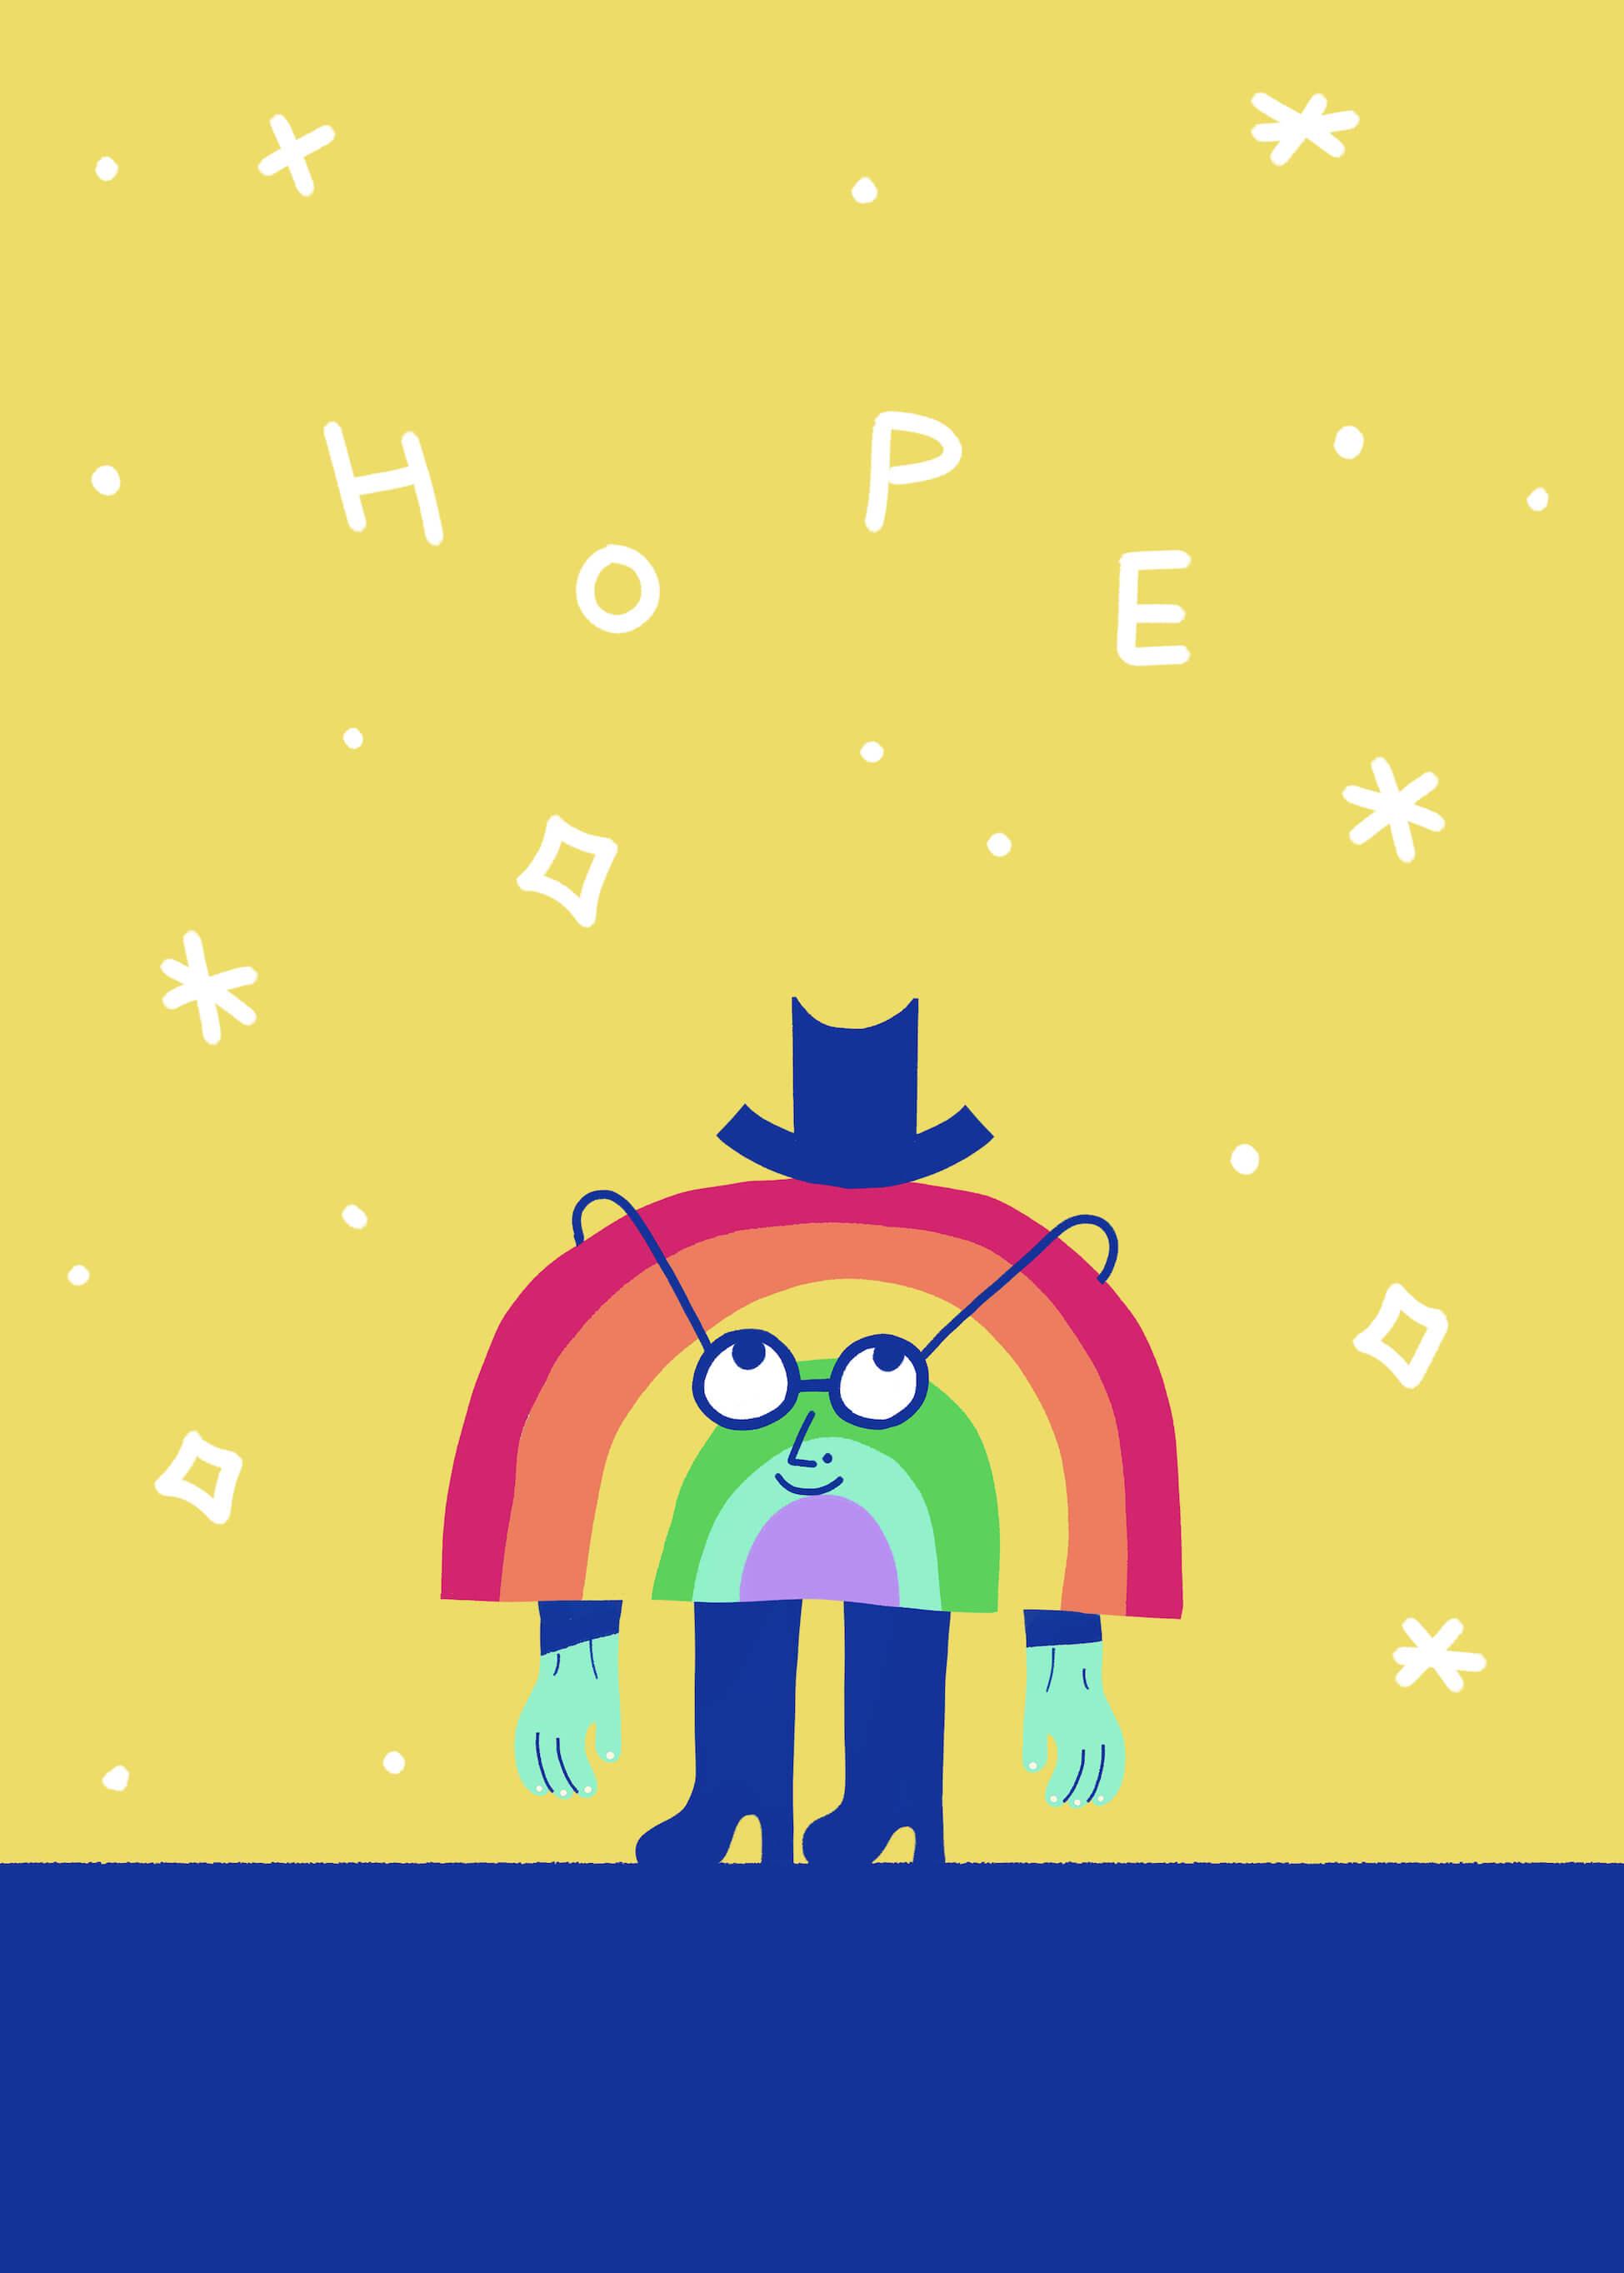 Hope Rainbow main image